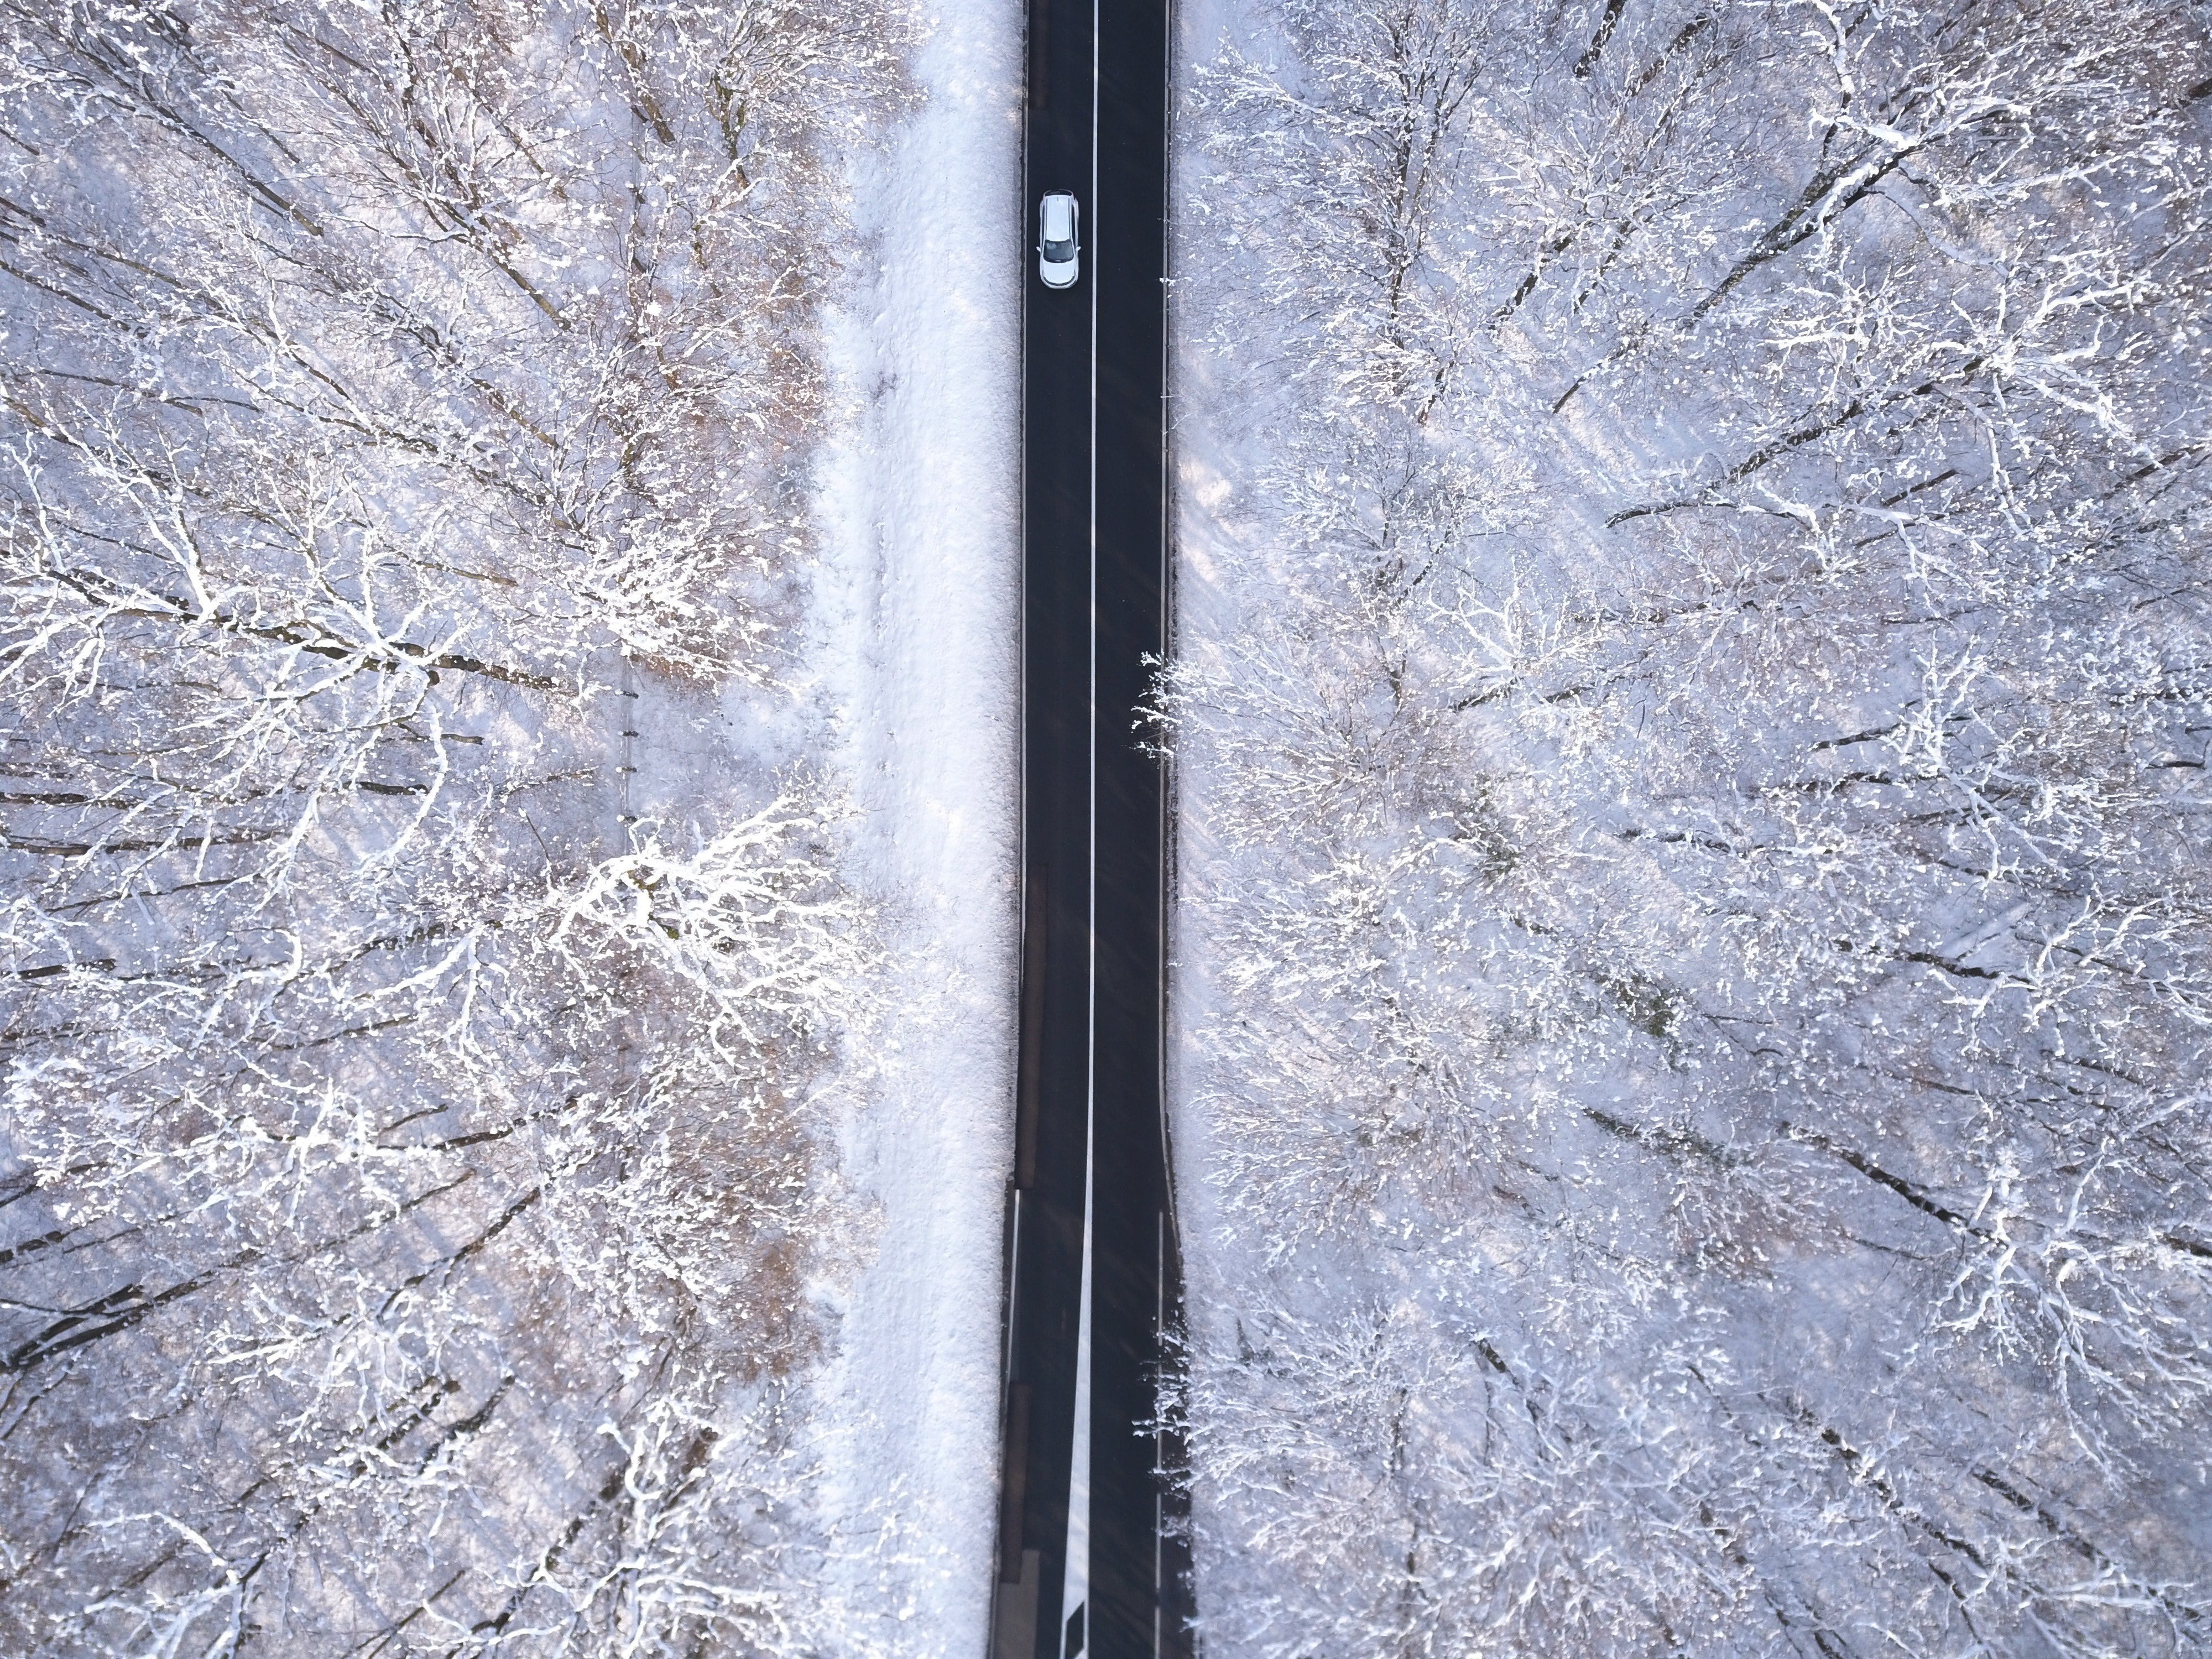 bird-s-eye-view-car-cold-1702068.jpg